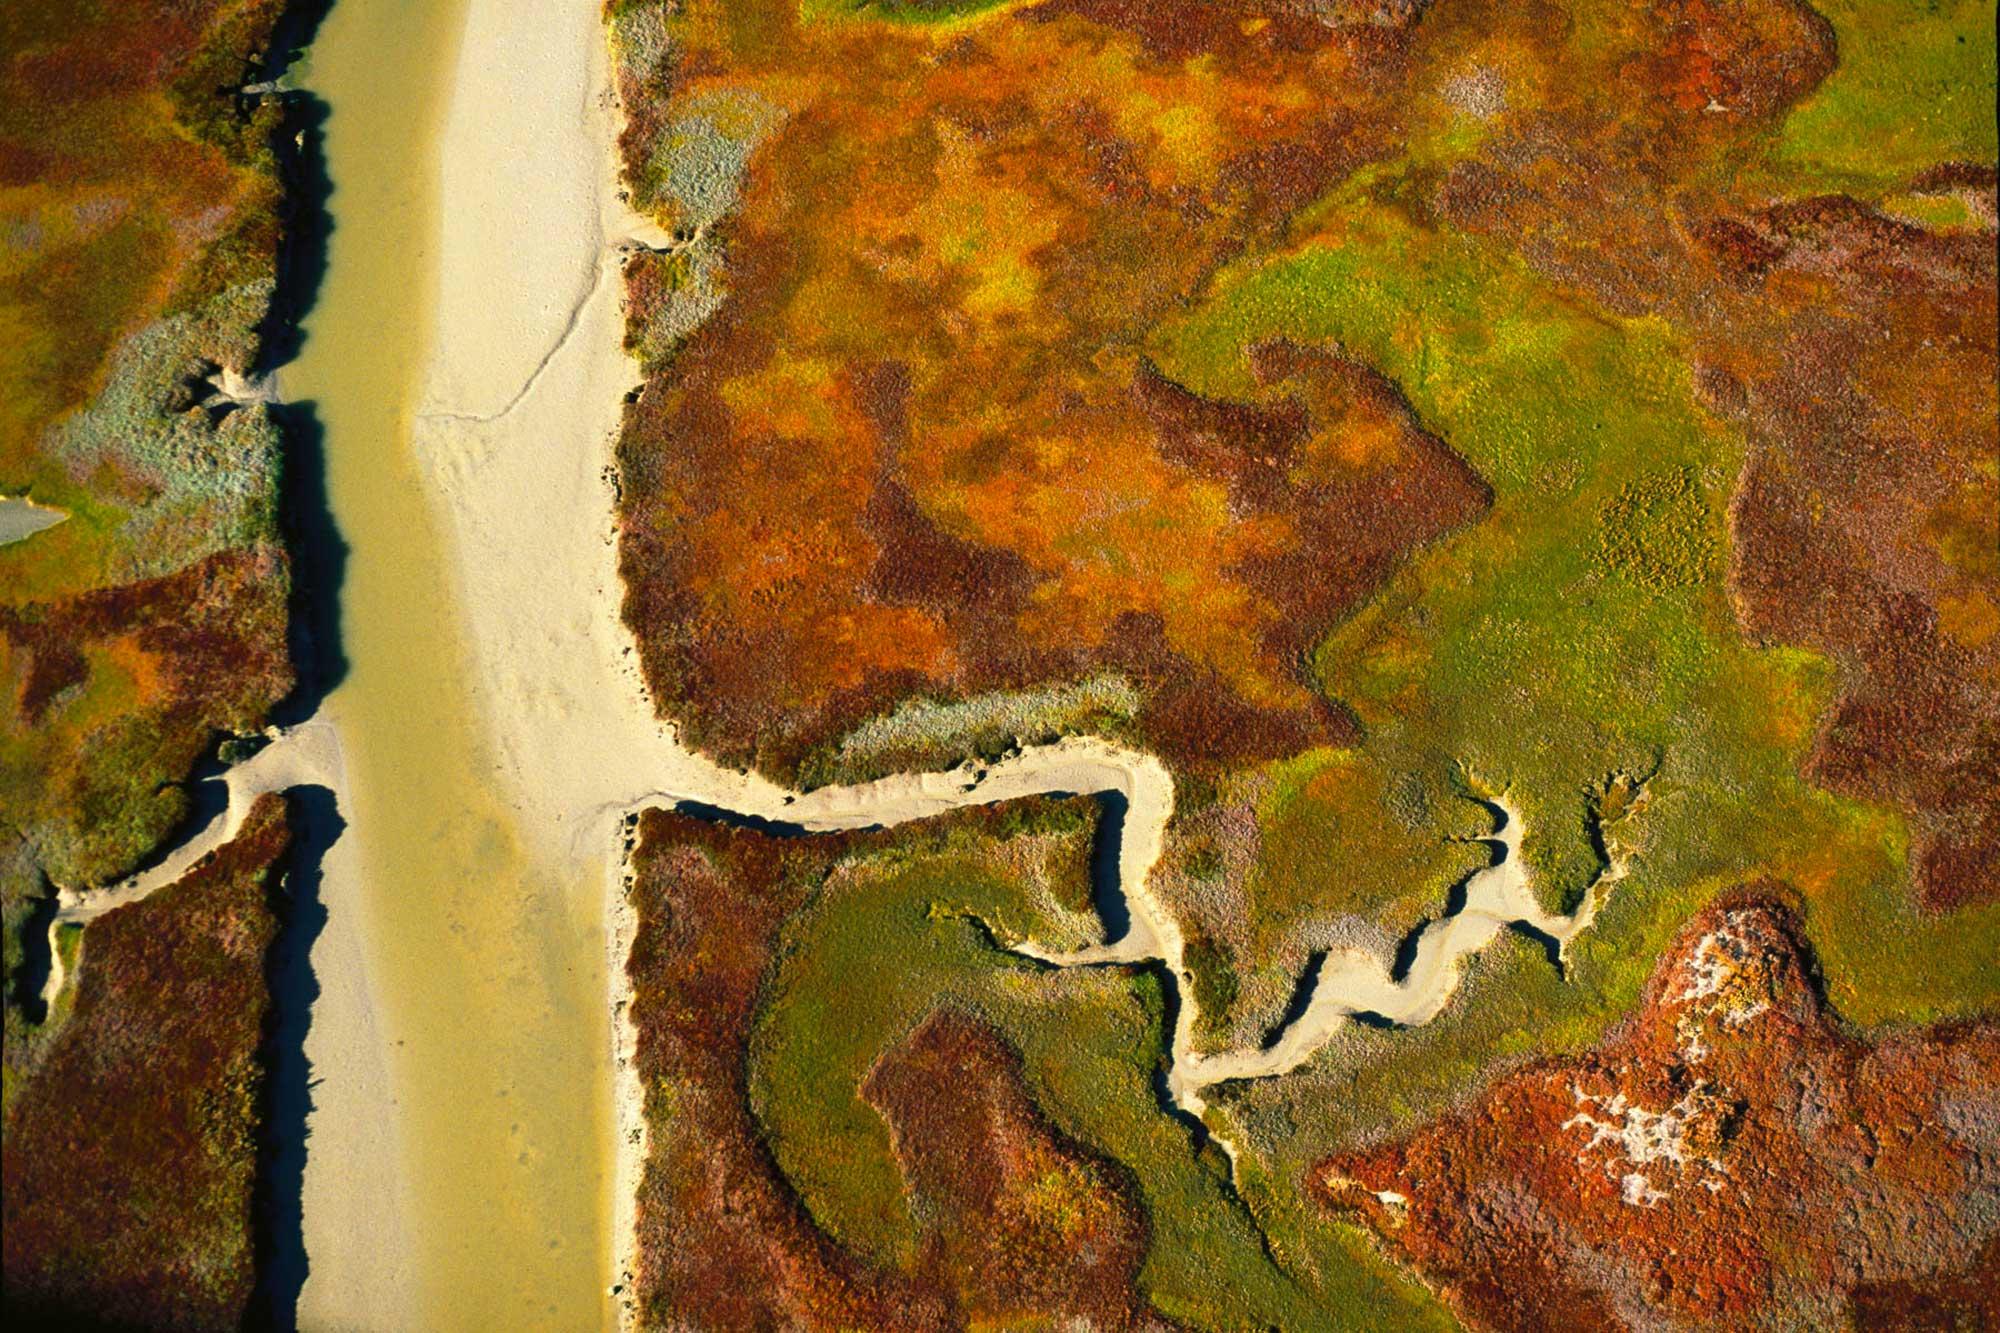 Marsh landscape - Yann Arthus-Bertrand